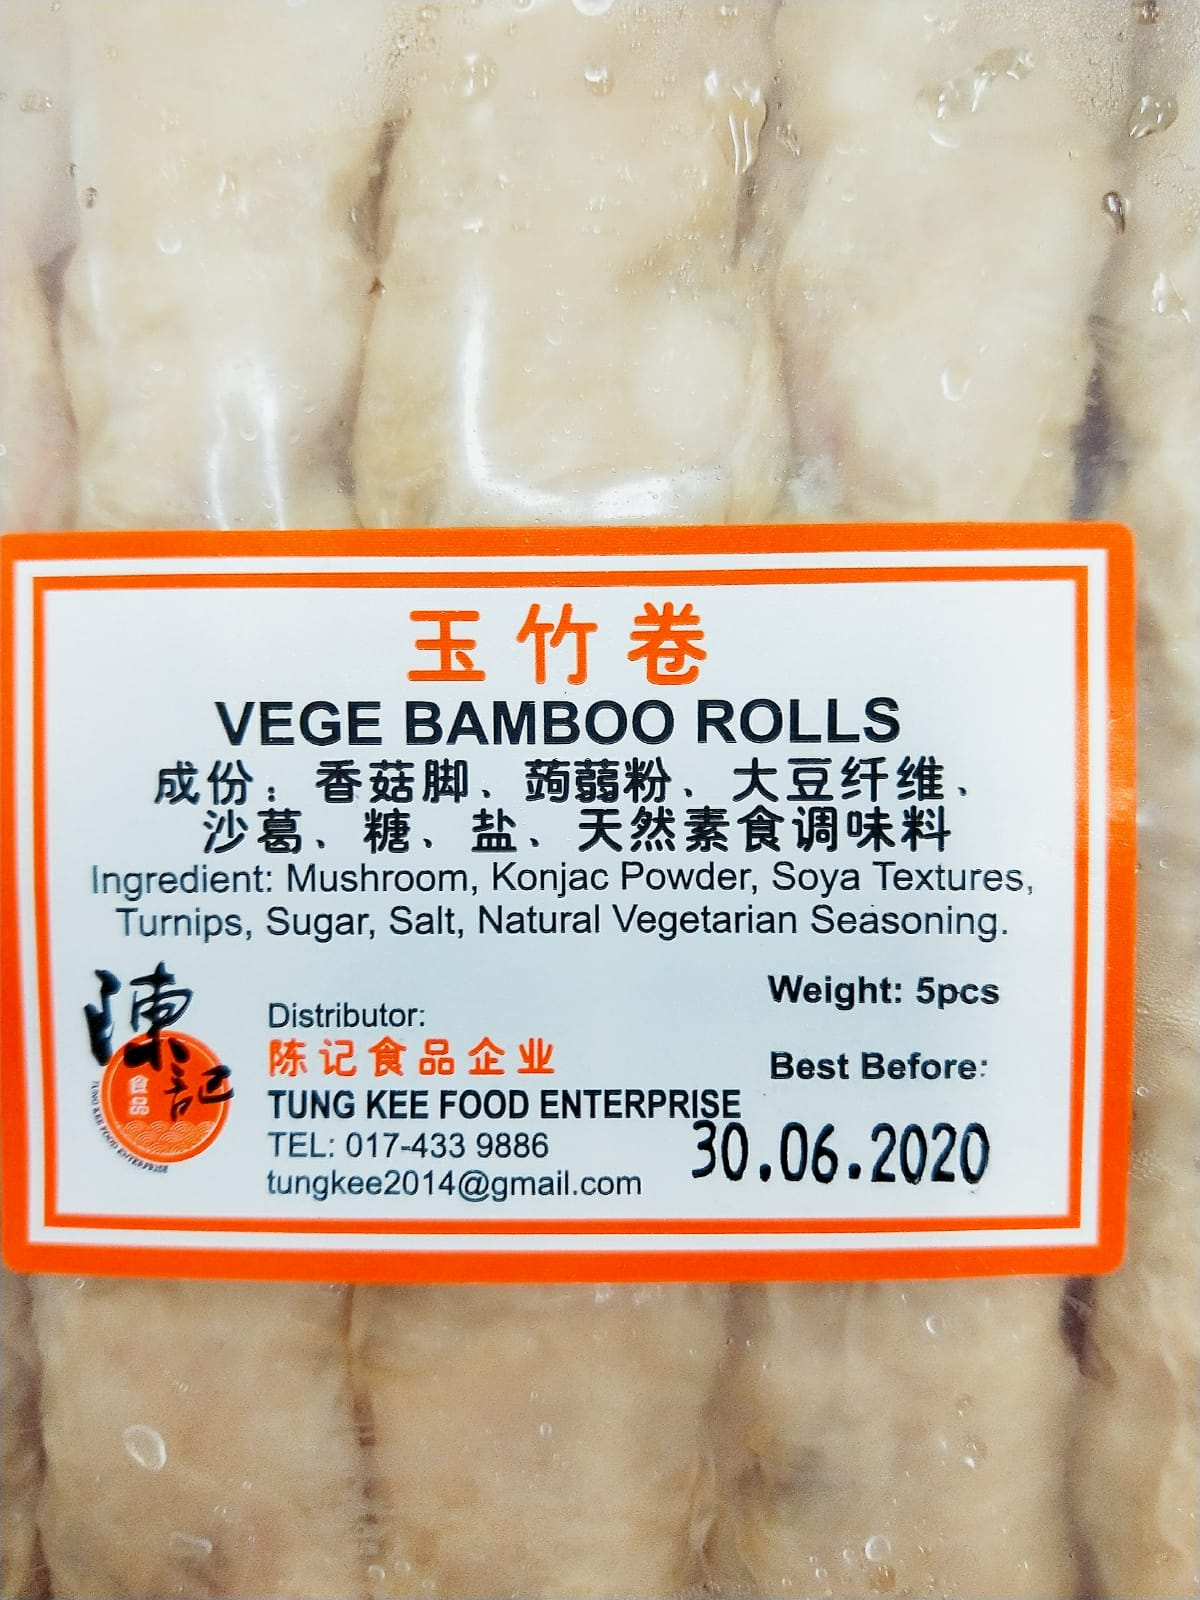 Image Vege Bamboo Rolls 陈记 - 玉竹卷 (5pcs) 260grans